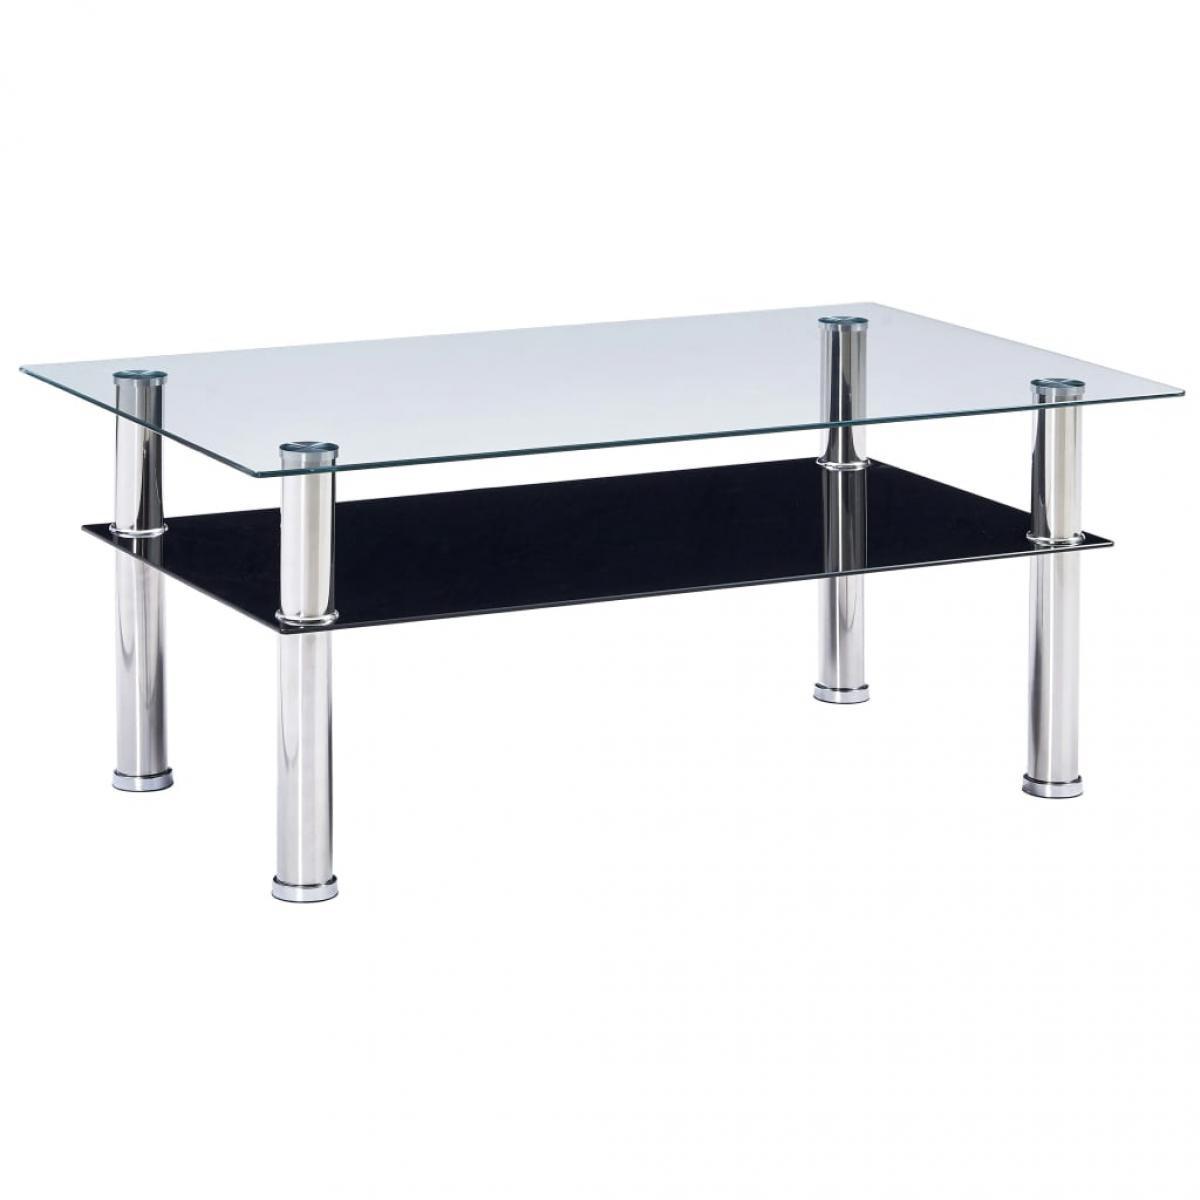 Vidaxl vidaXL Table basse Noir 100x60x42 cm Verre trempé